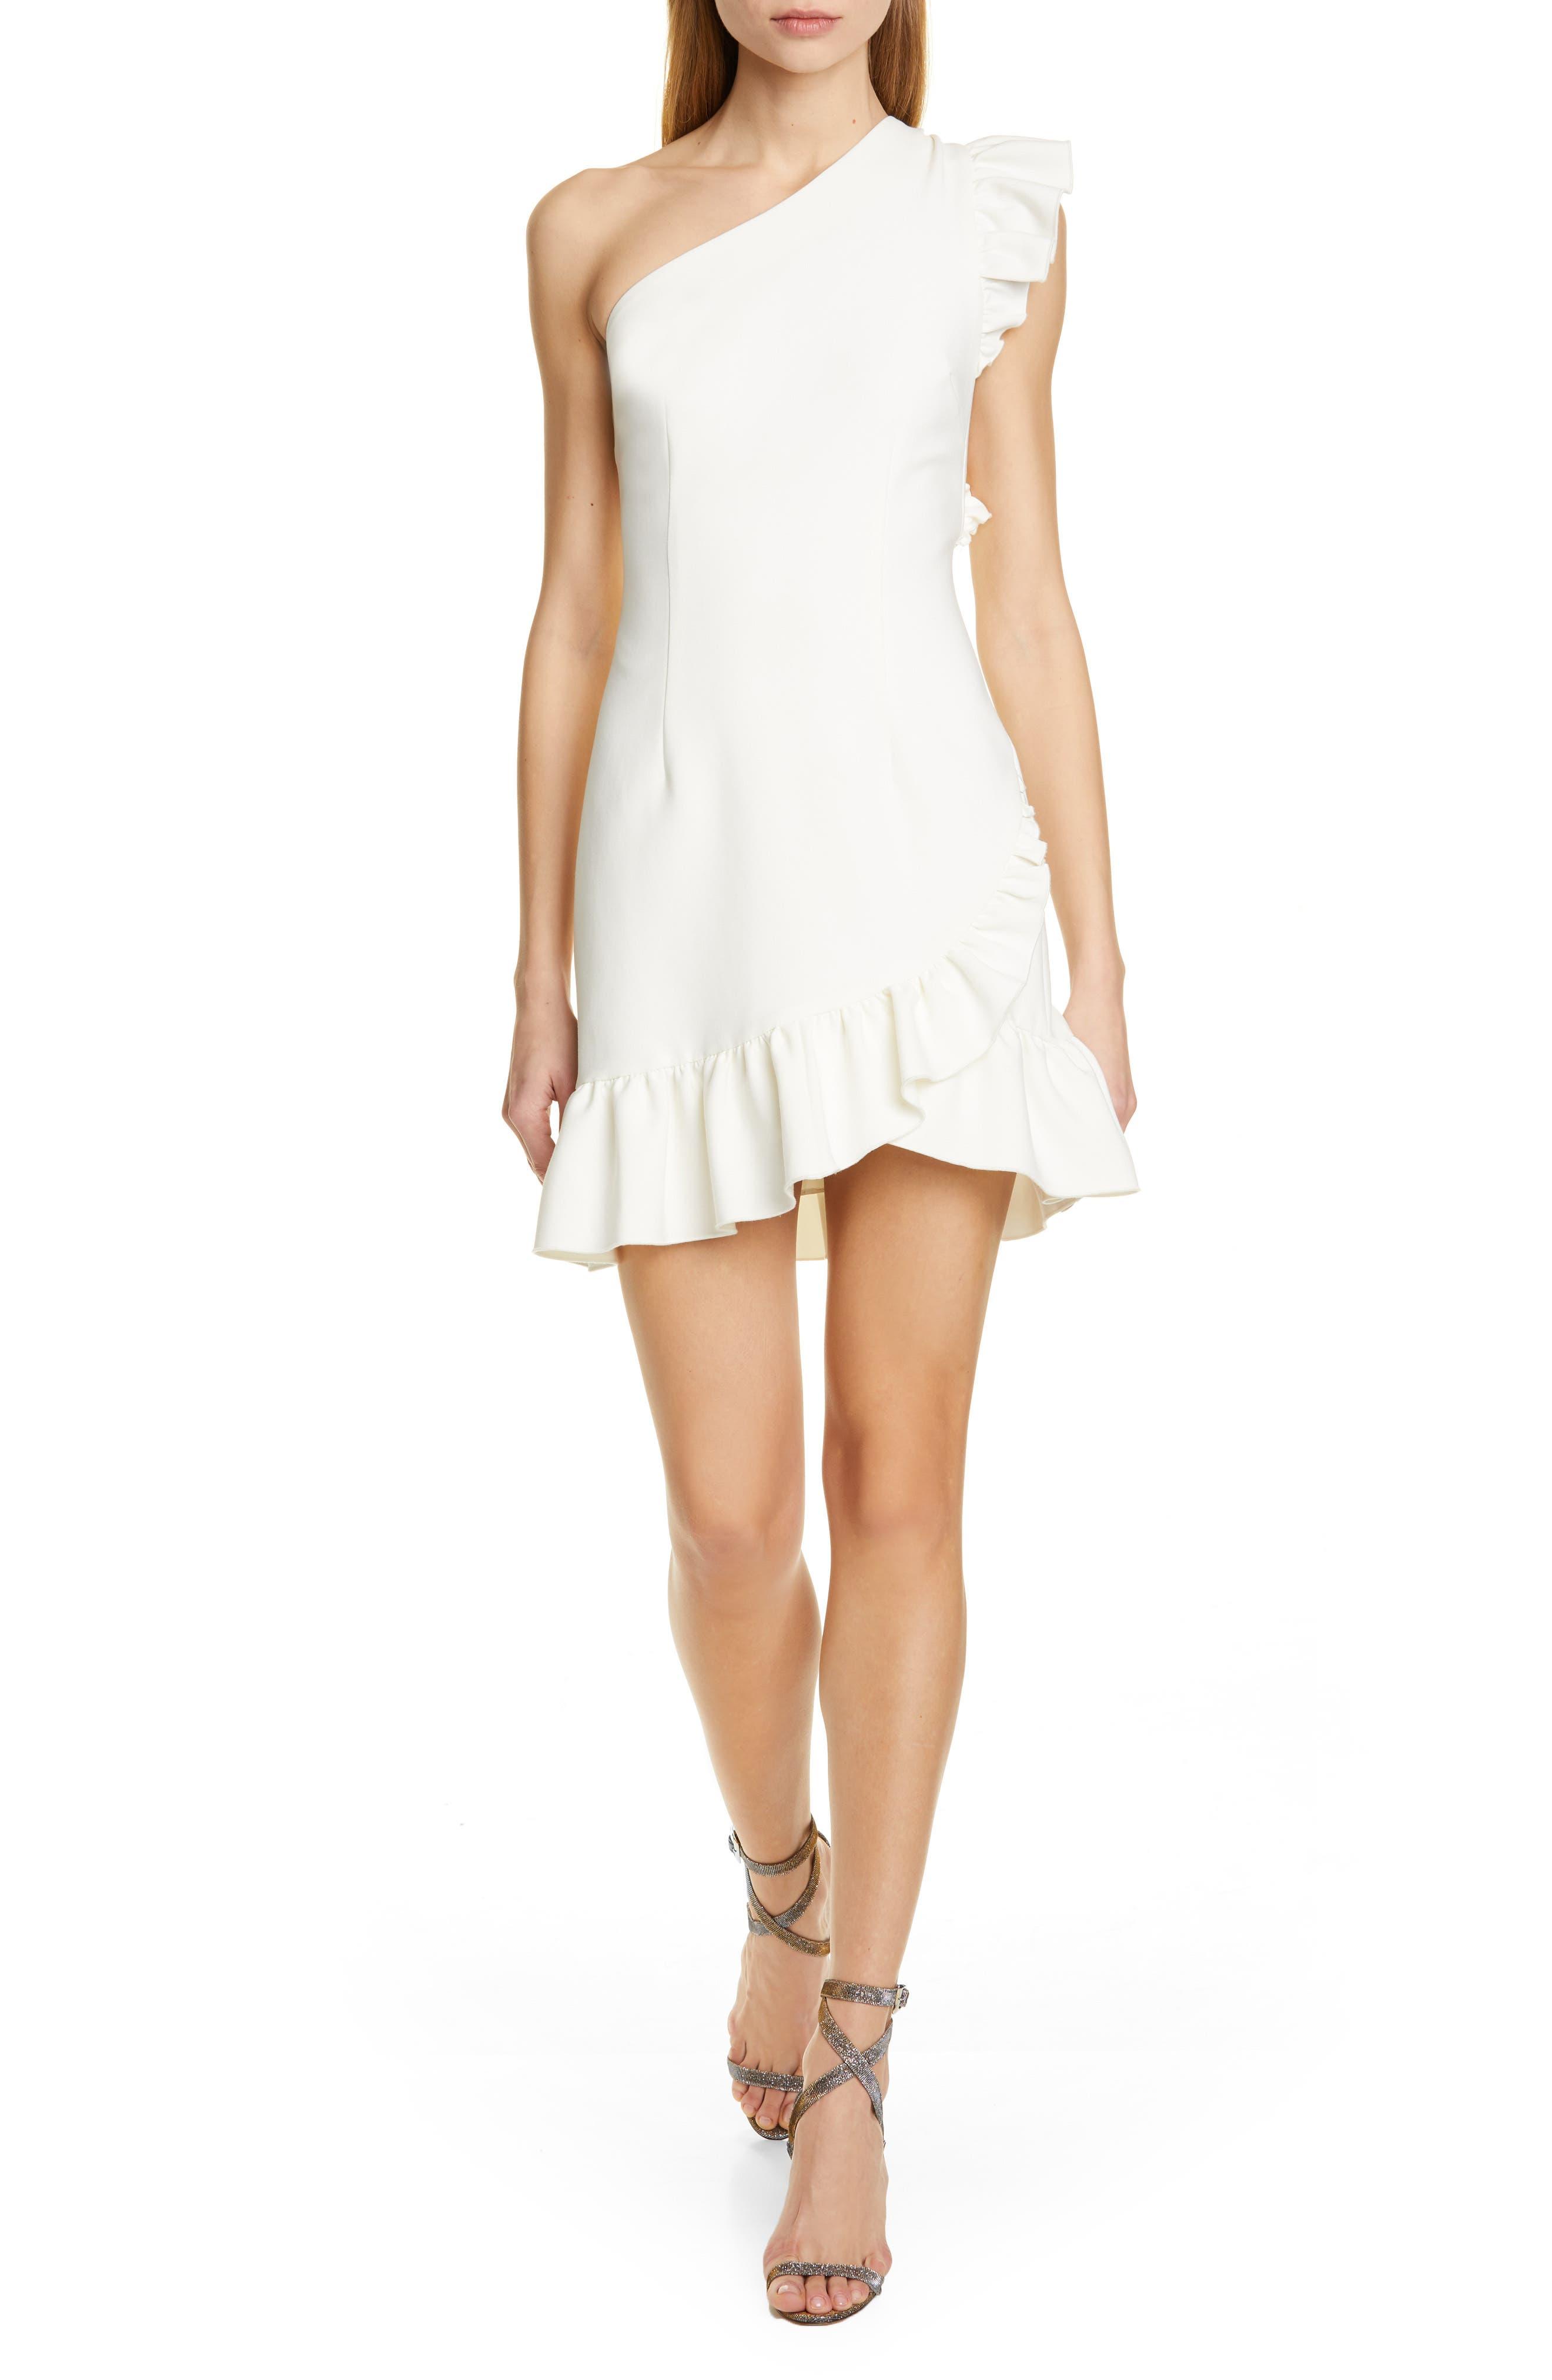 Cinq A Sept Soleil One-Shoulder Minidress, Ivory